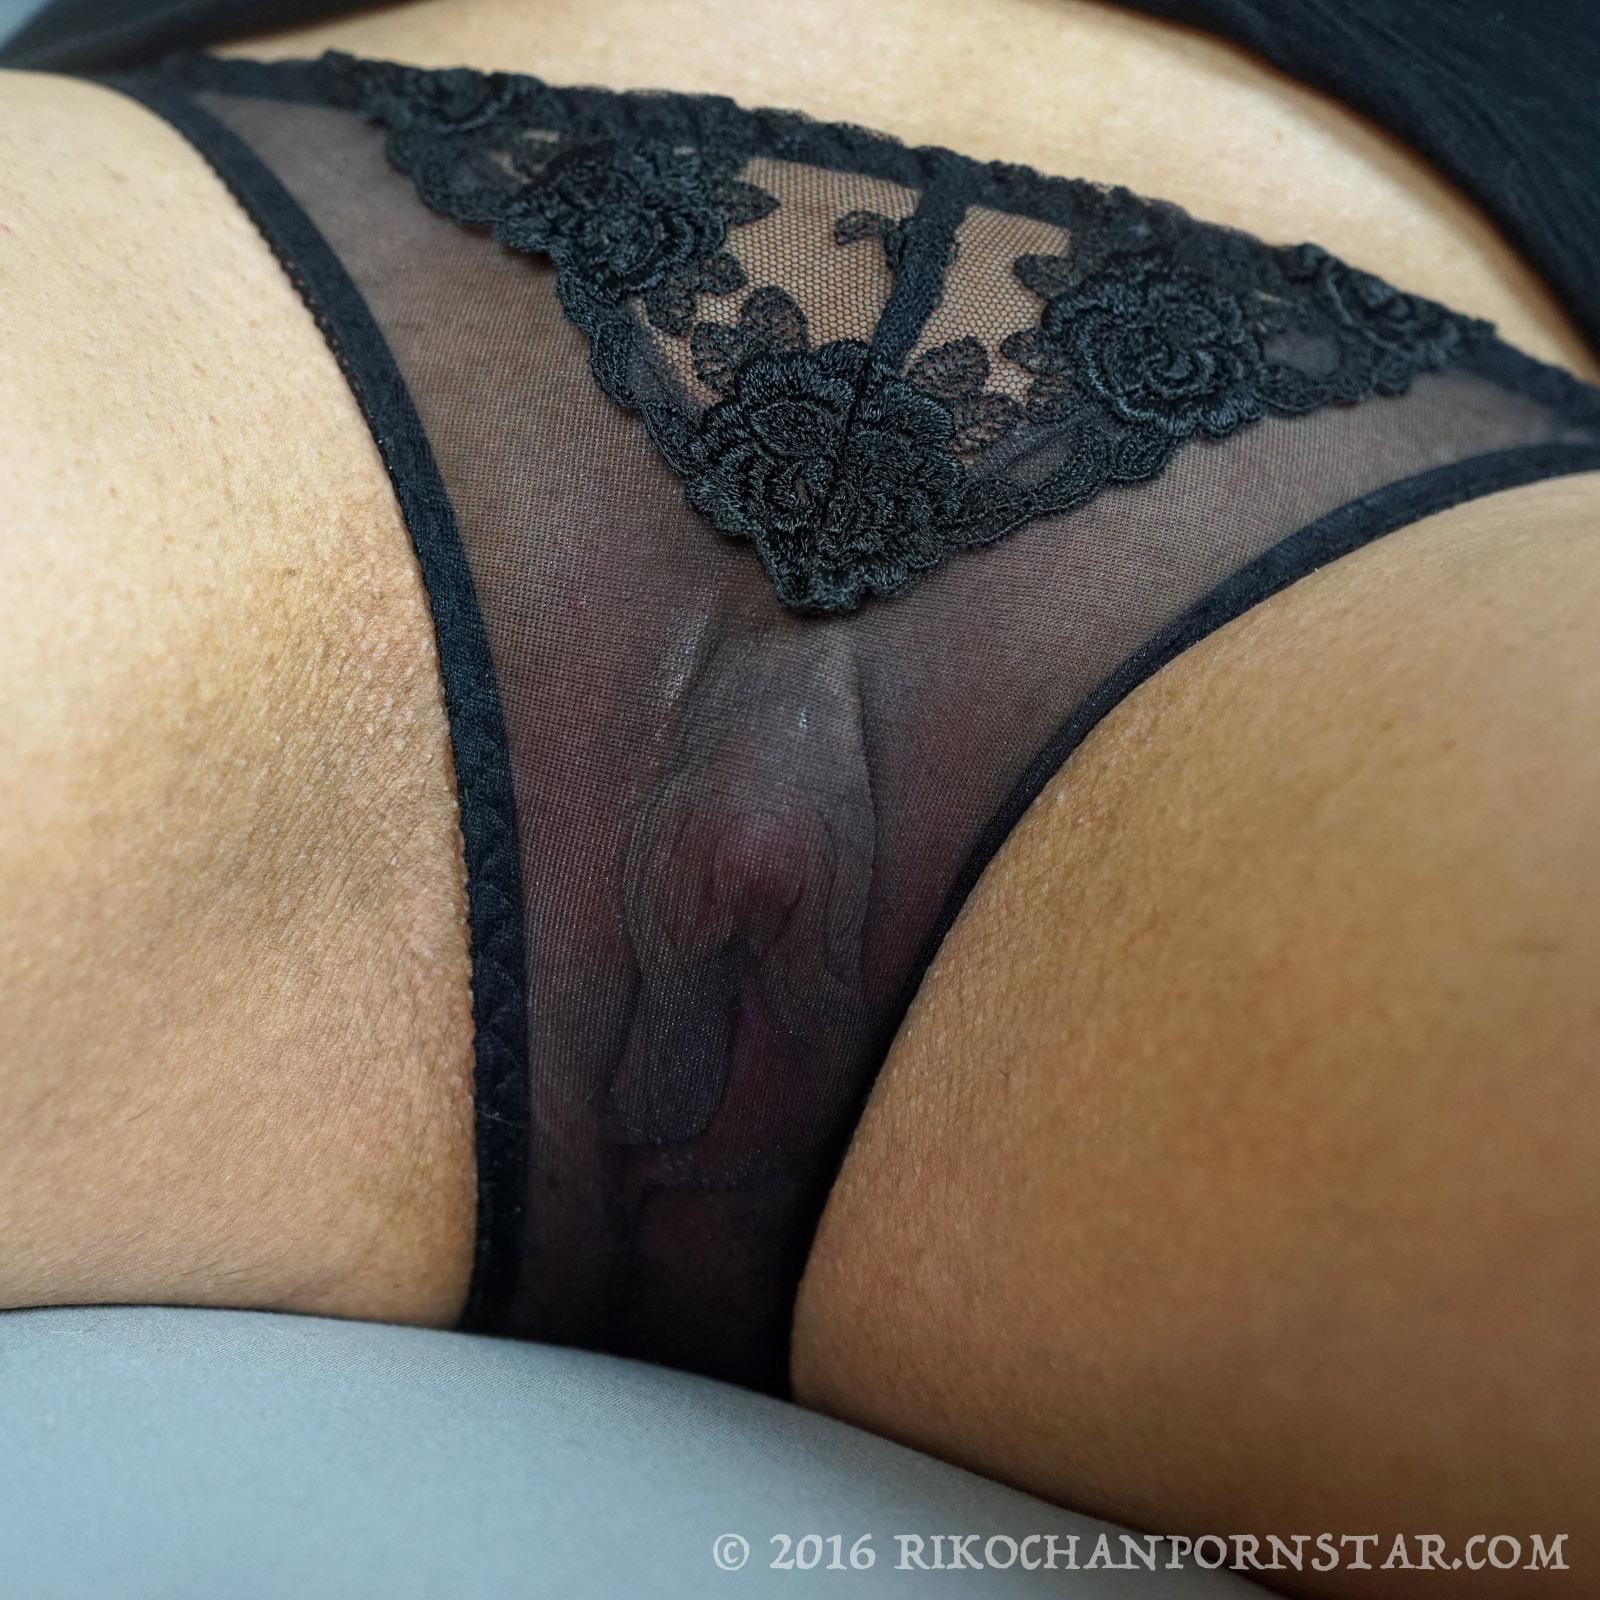 Big clit in panties